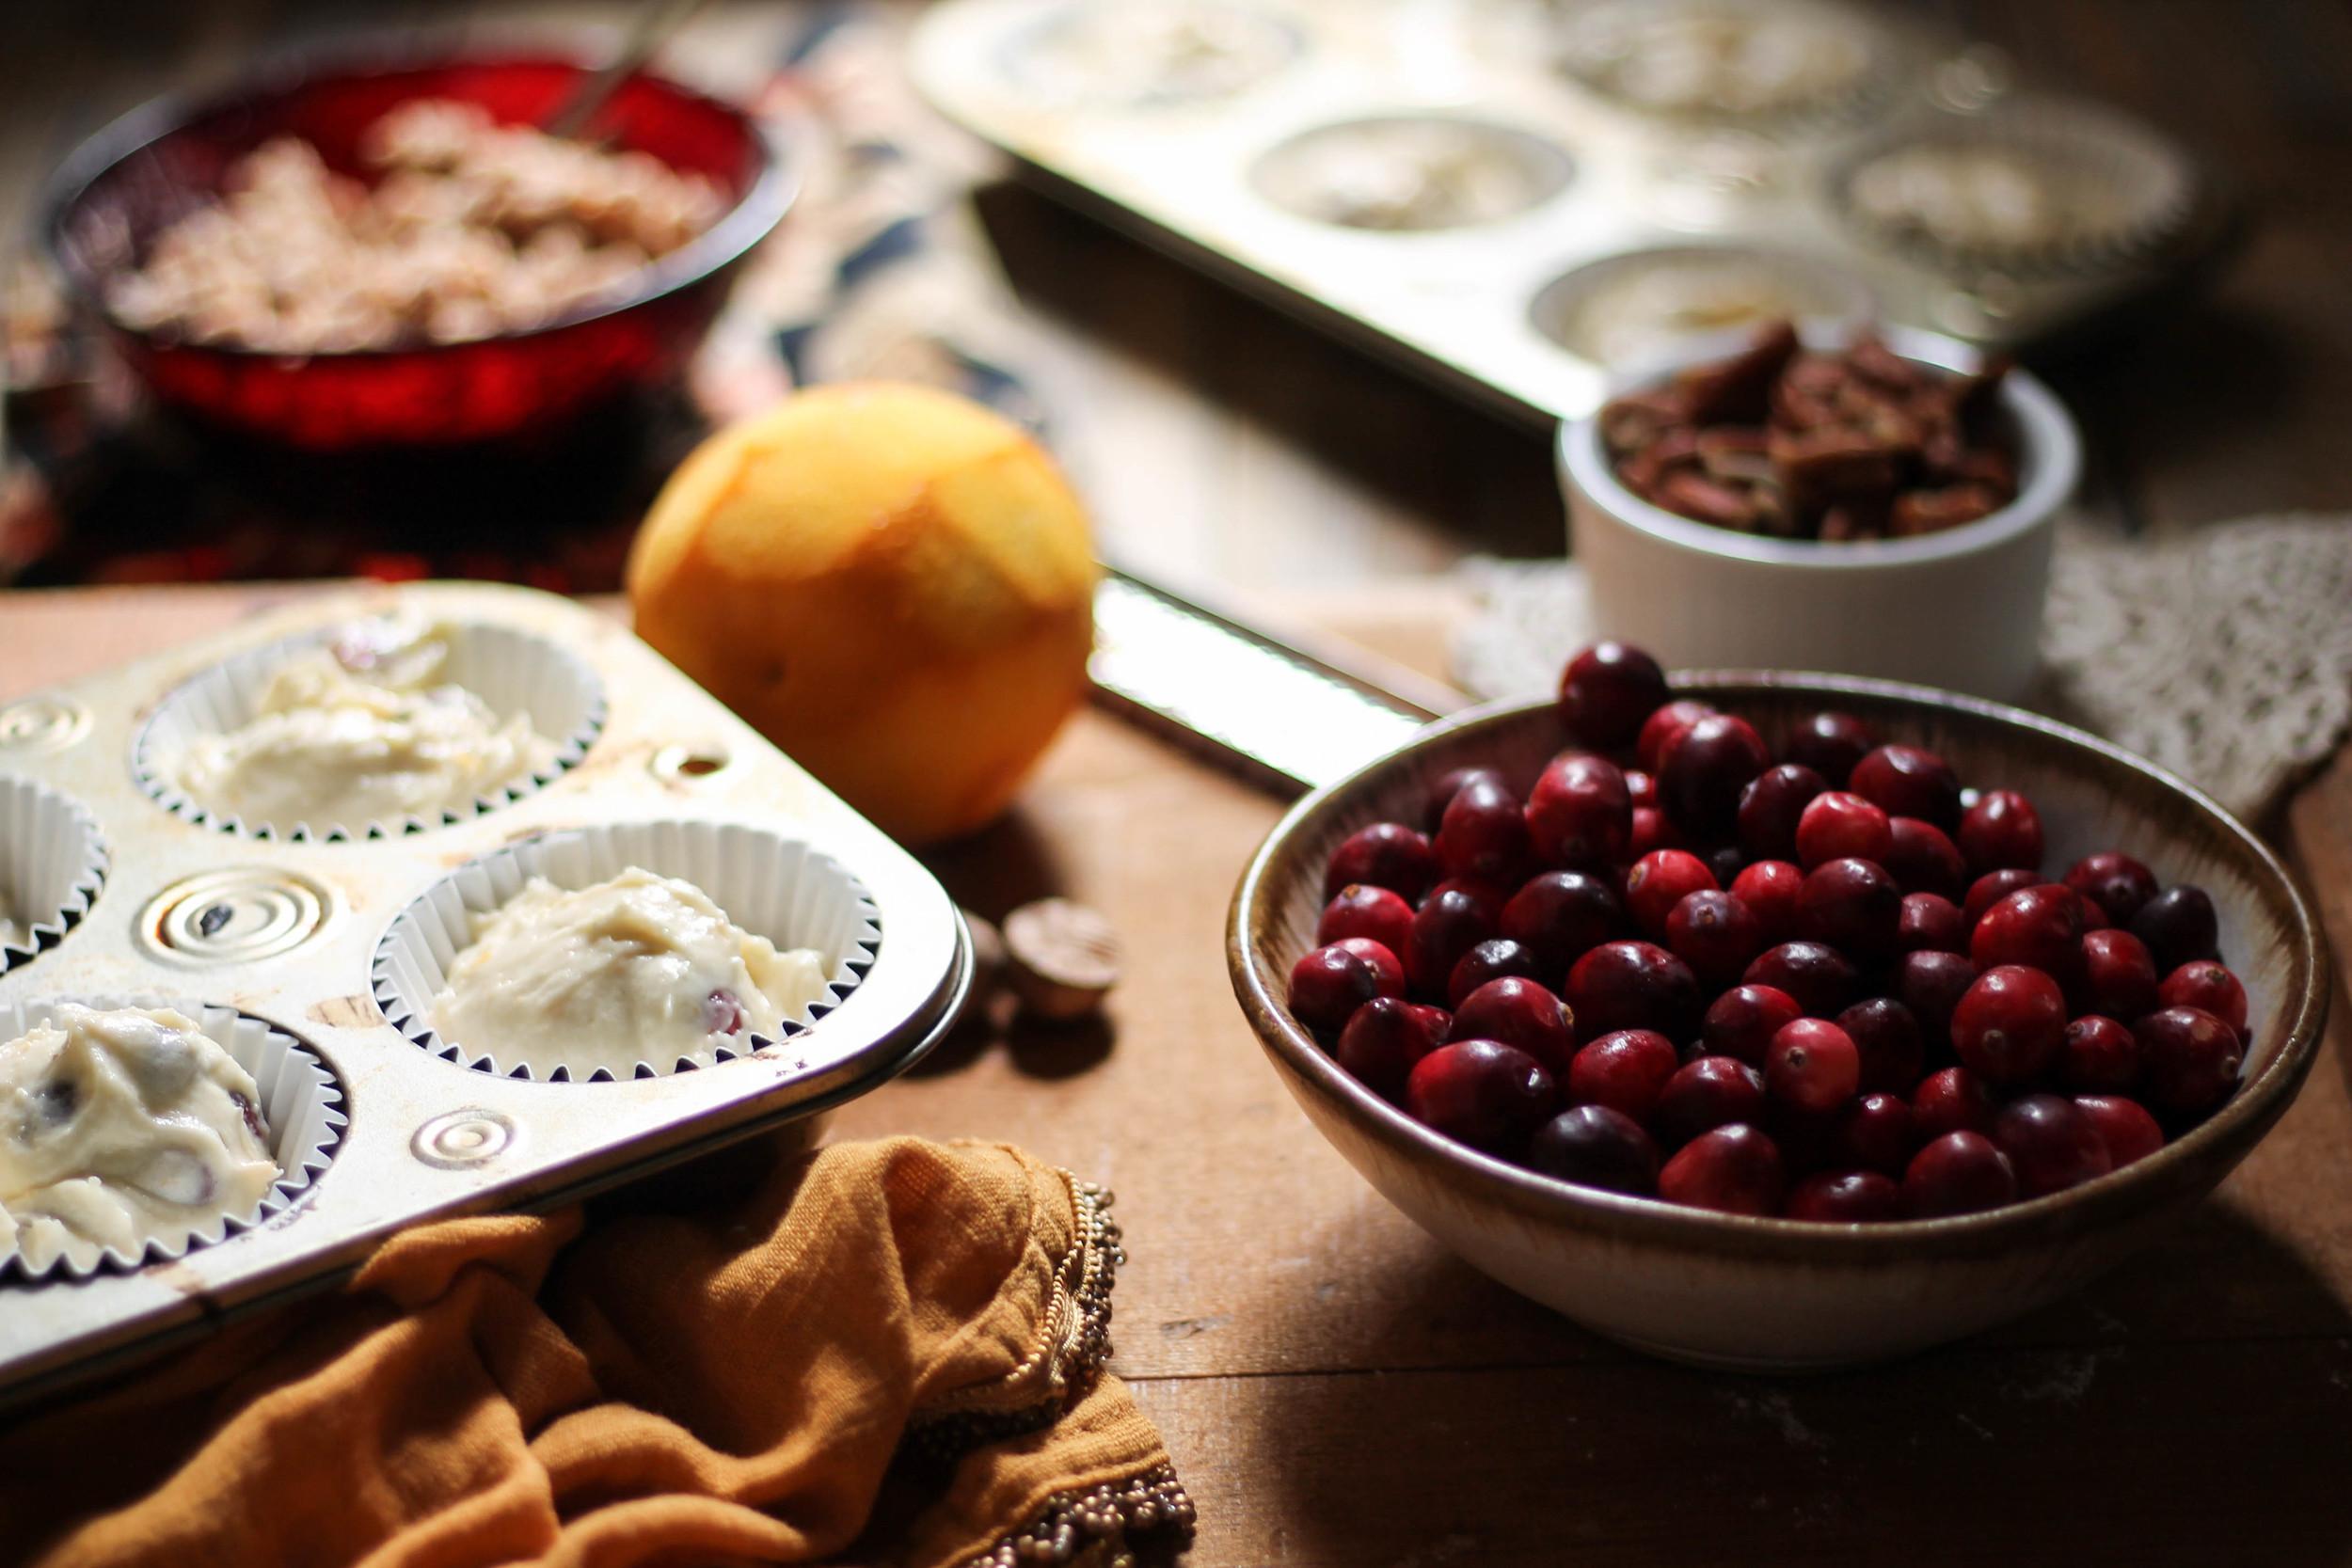 Cranberry Orange Muffins with Pecan Cinnamon Streusel {The Pedantic Foodie}